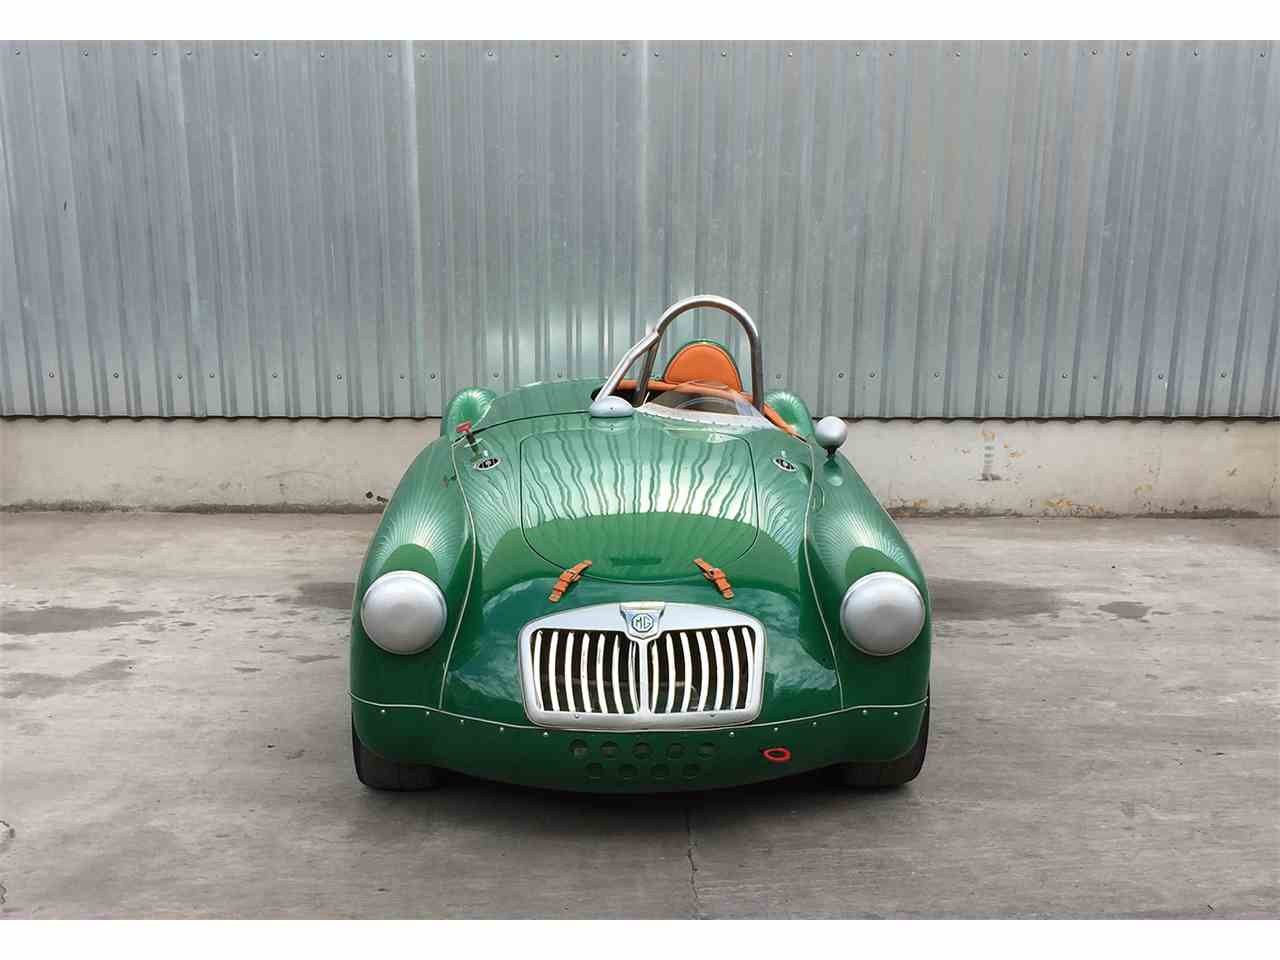 1958 MG MGA Racecar for Sale   ClassicCars.com   CC-1008163